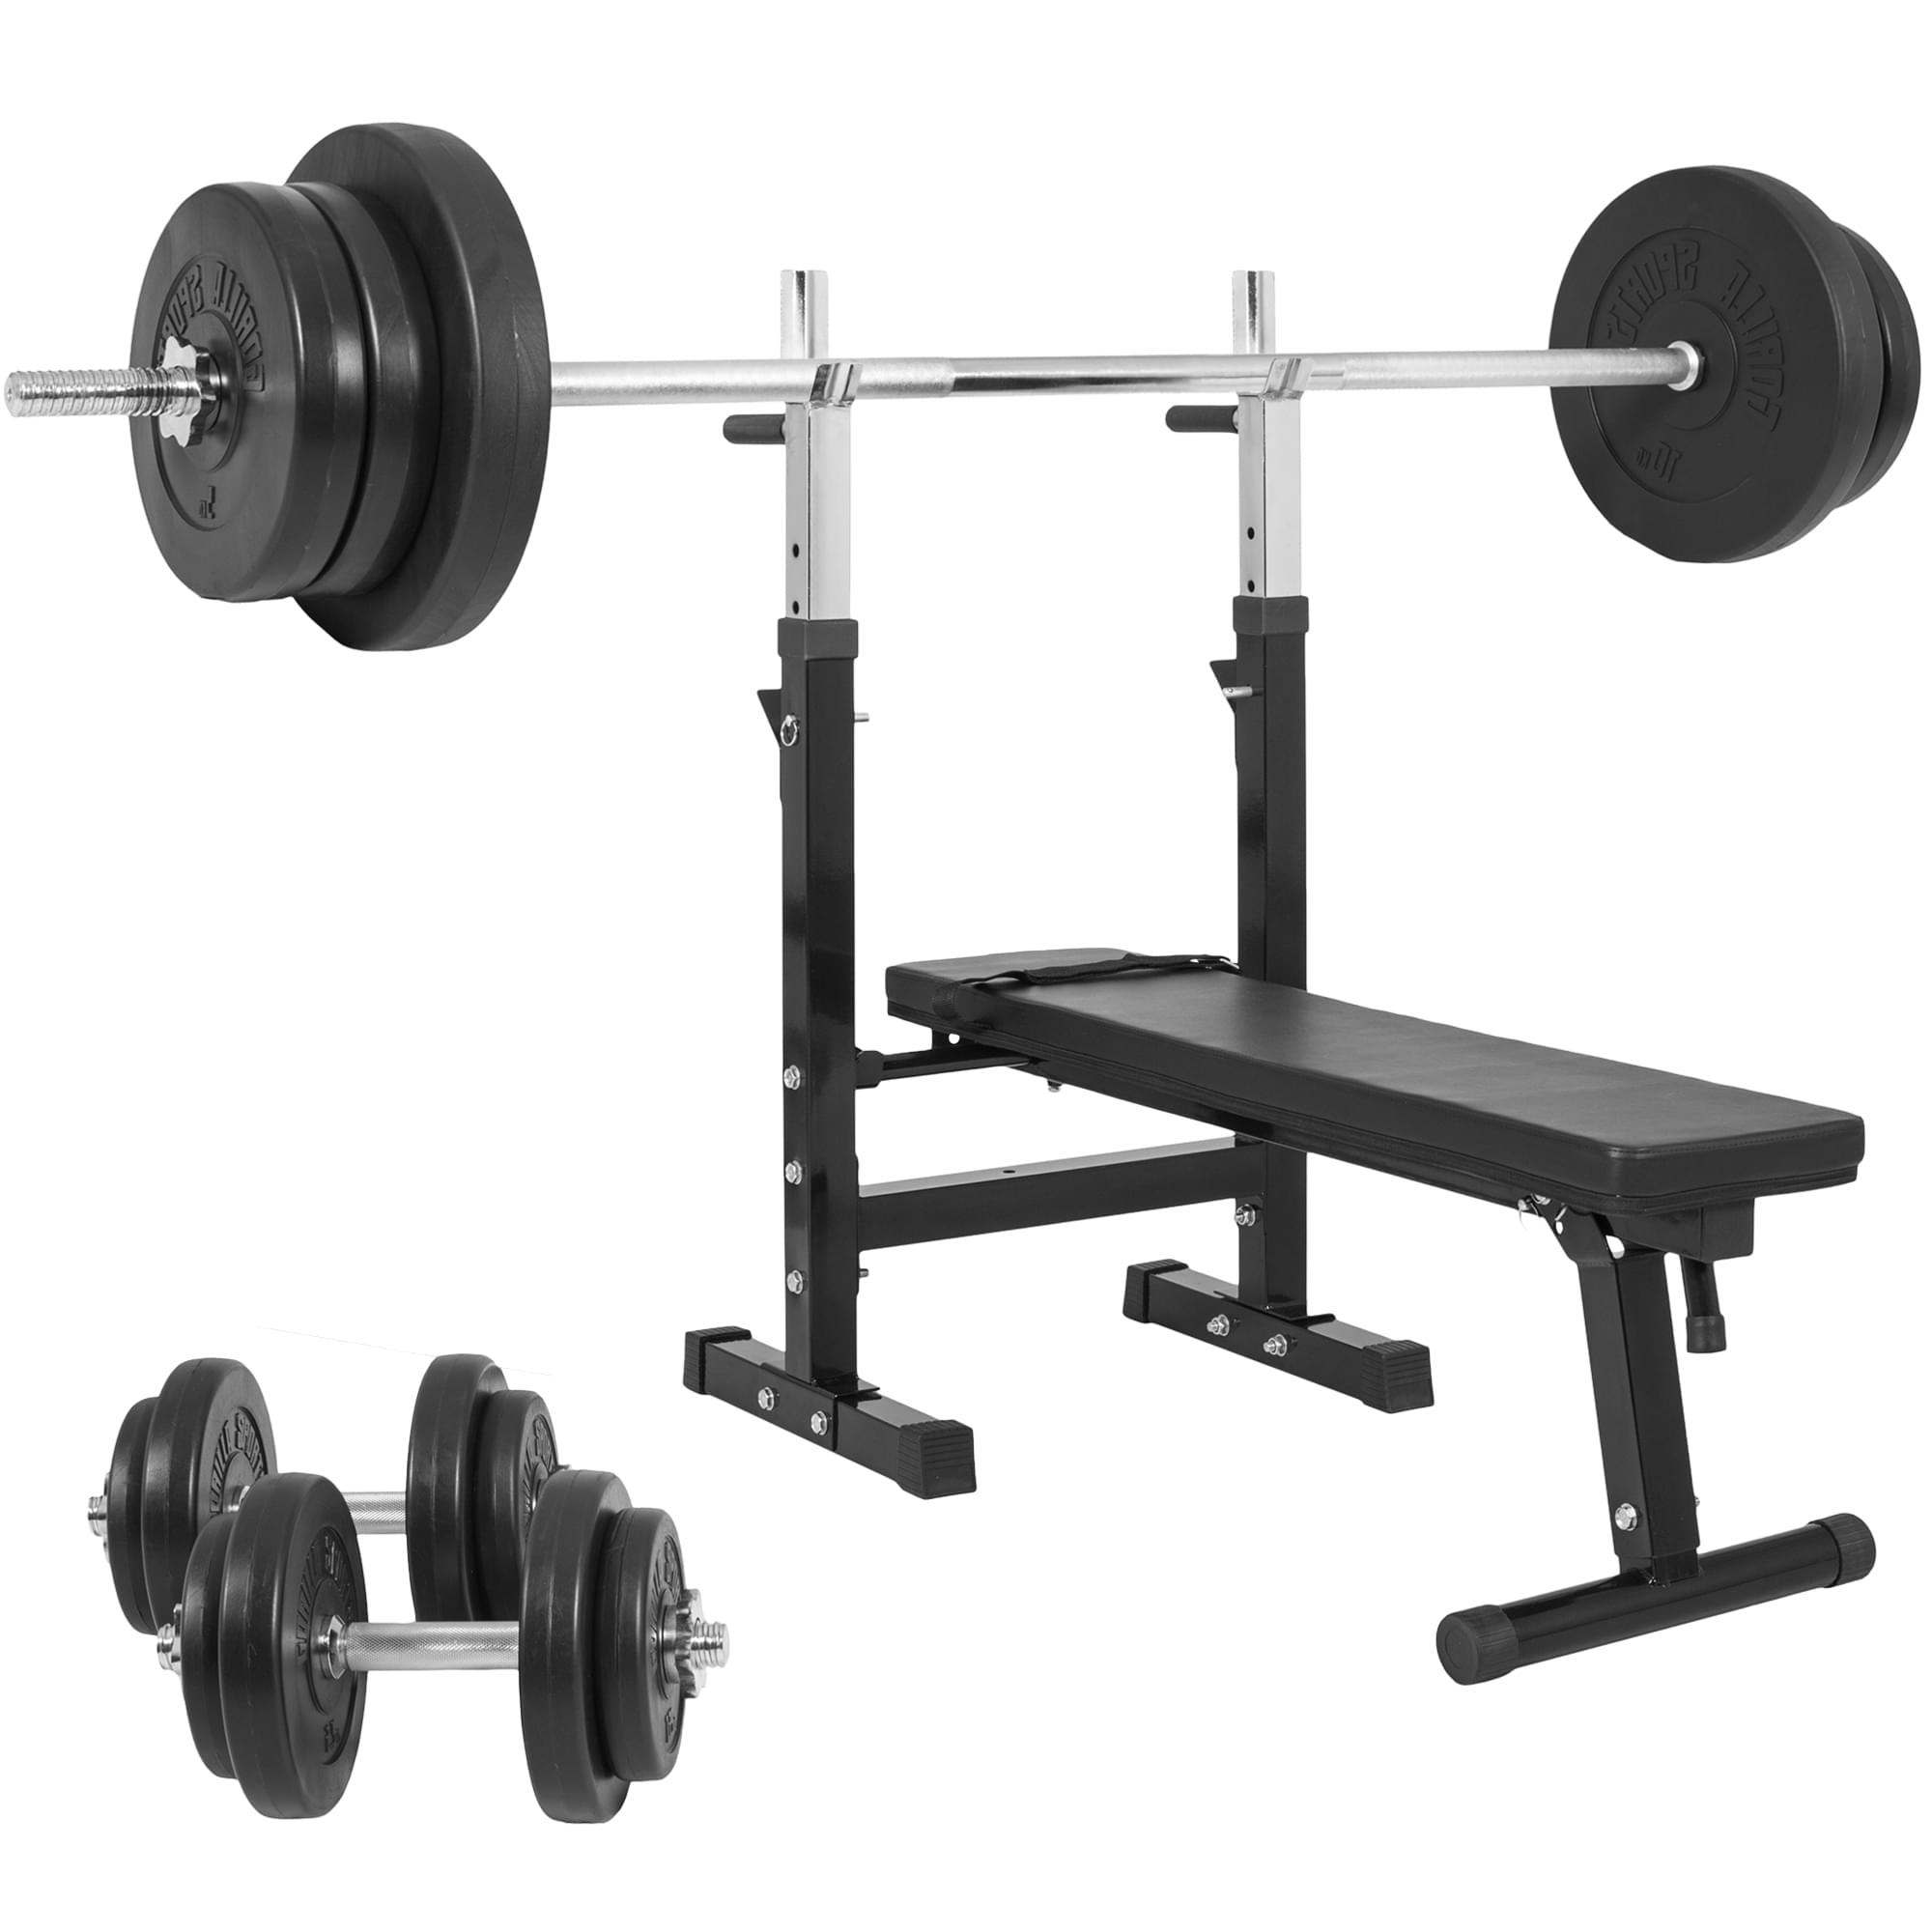 Gorilla Sports Hantelbank mit Langhantelset 70 kg 100420-00006-0046